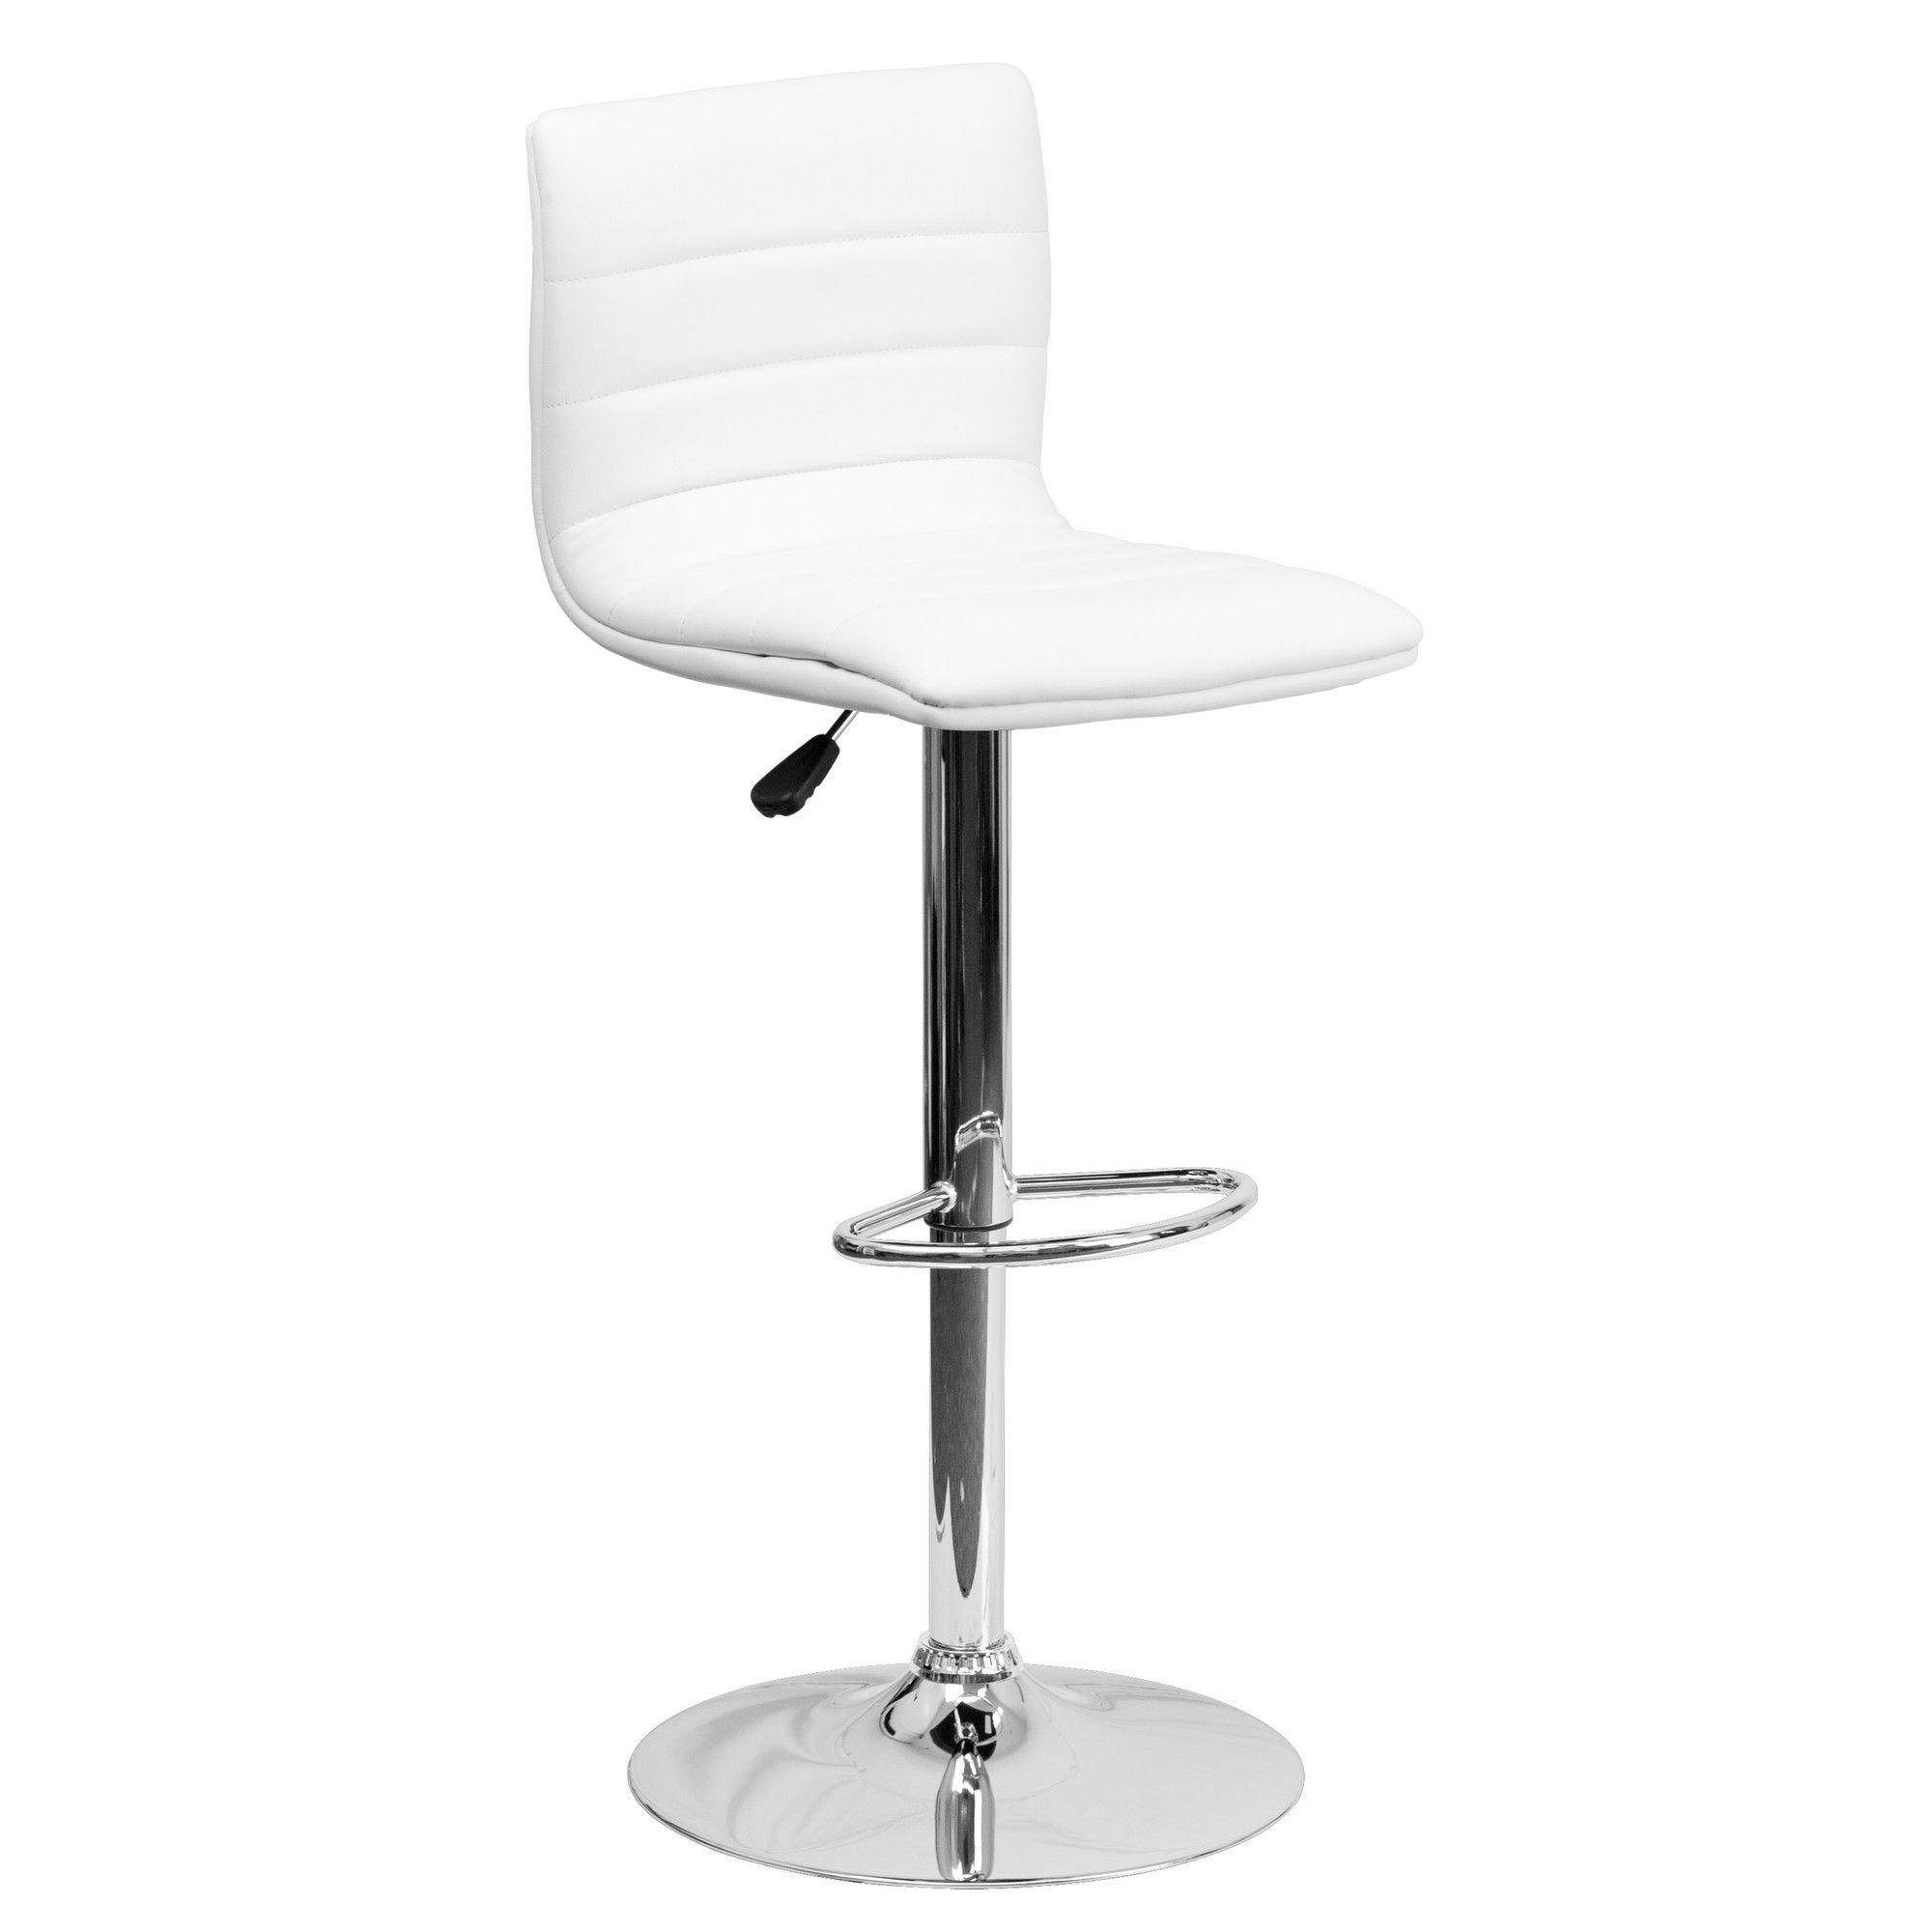 Flash Furniture Contemporary Vinyl Adjustable Height Bar Stool Vinyl Bar Stool Contemporary Bar Stools Adjustable Bar Stools